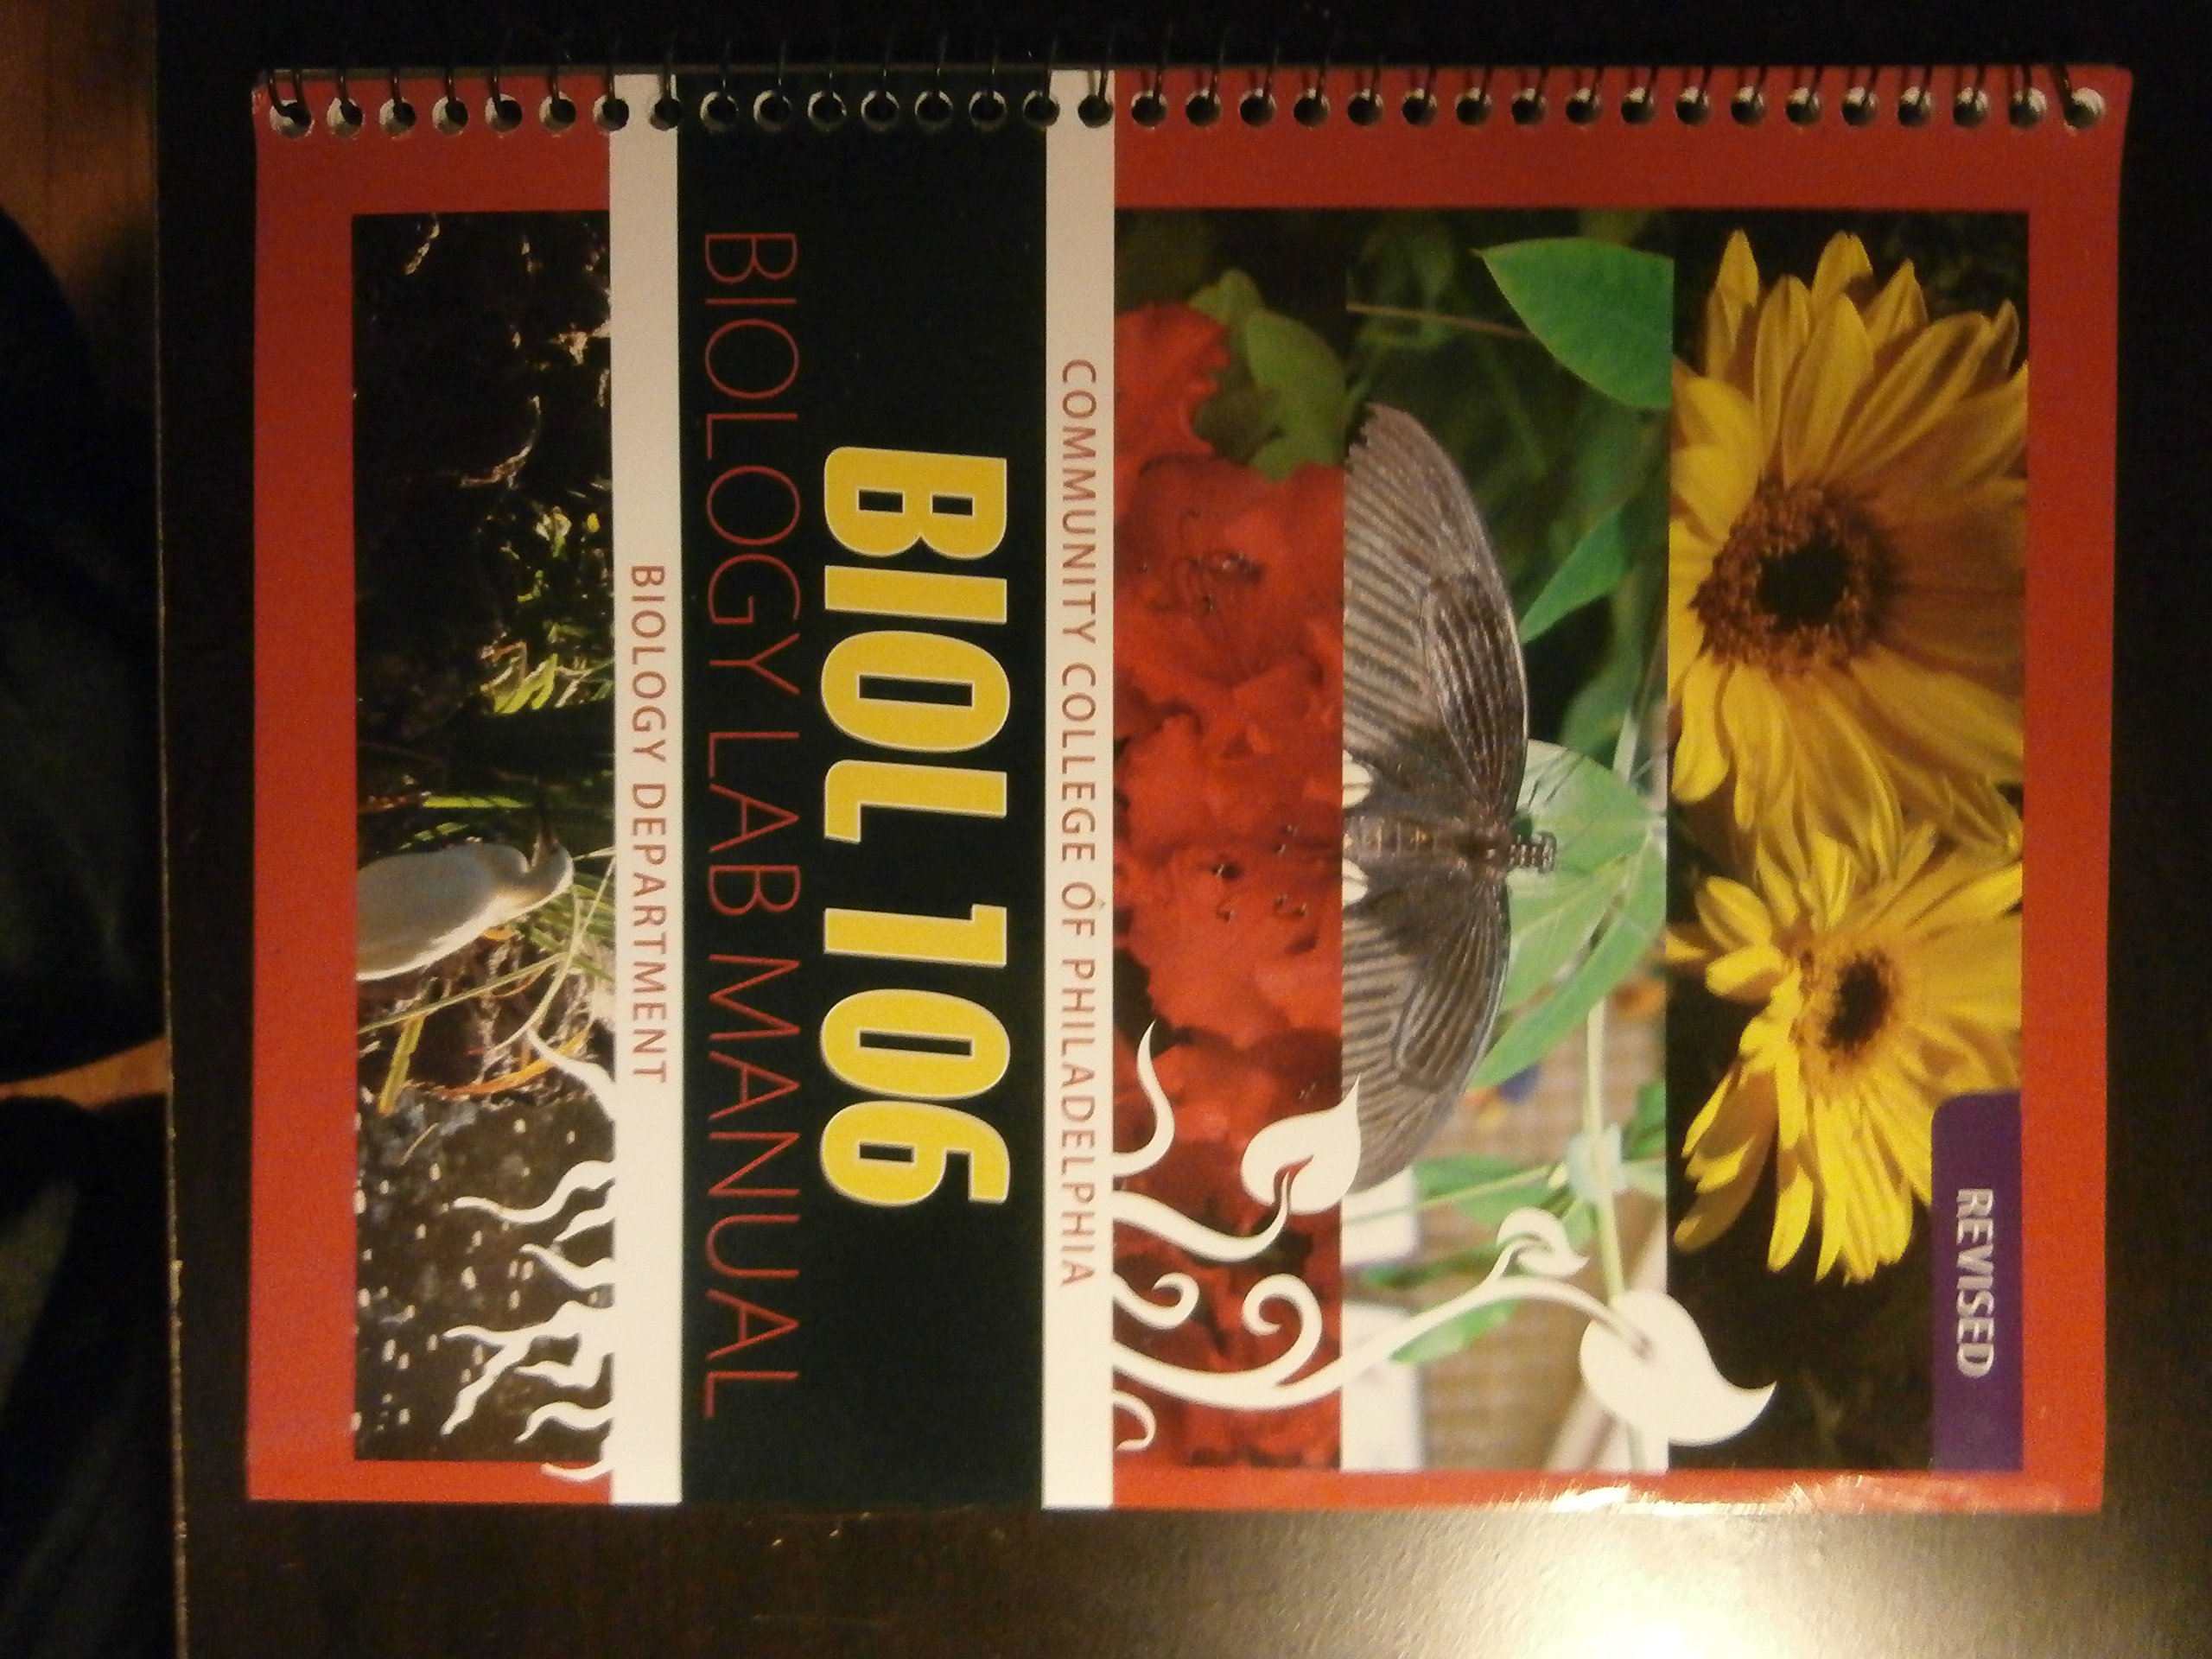 Community College of Philadelphia Bio 106 Biology Lab Manual Revised,  Biology Department: Revised: Community College of Philadelphia McGraw Hill  Companies: ...